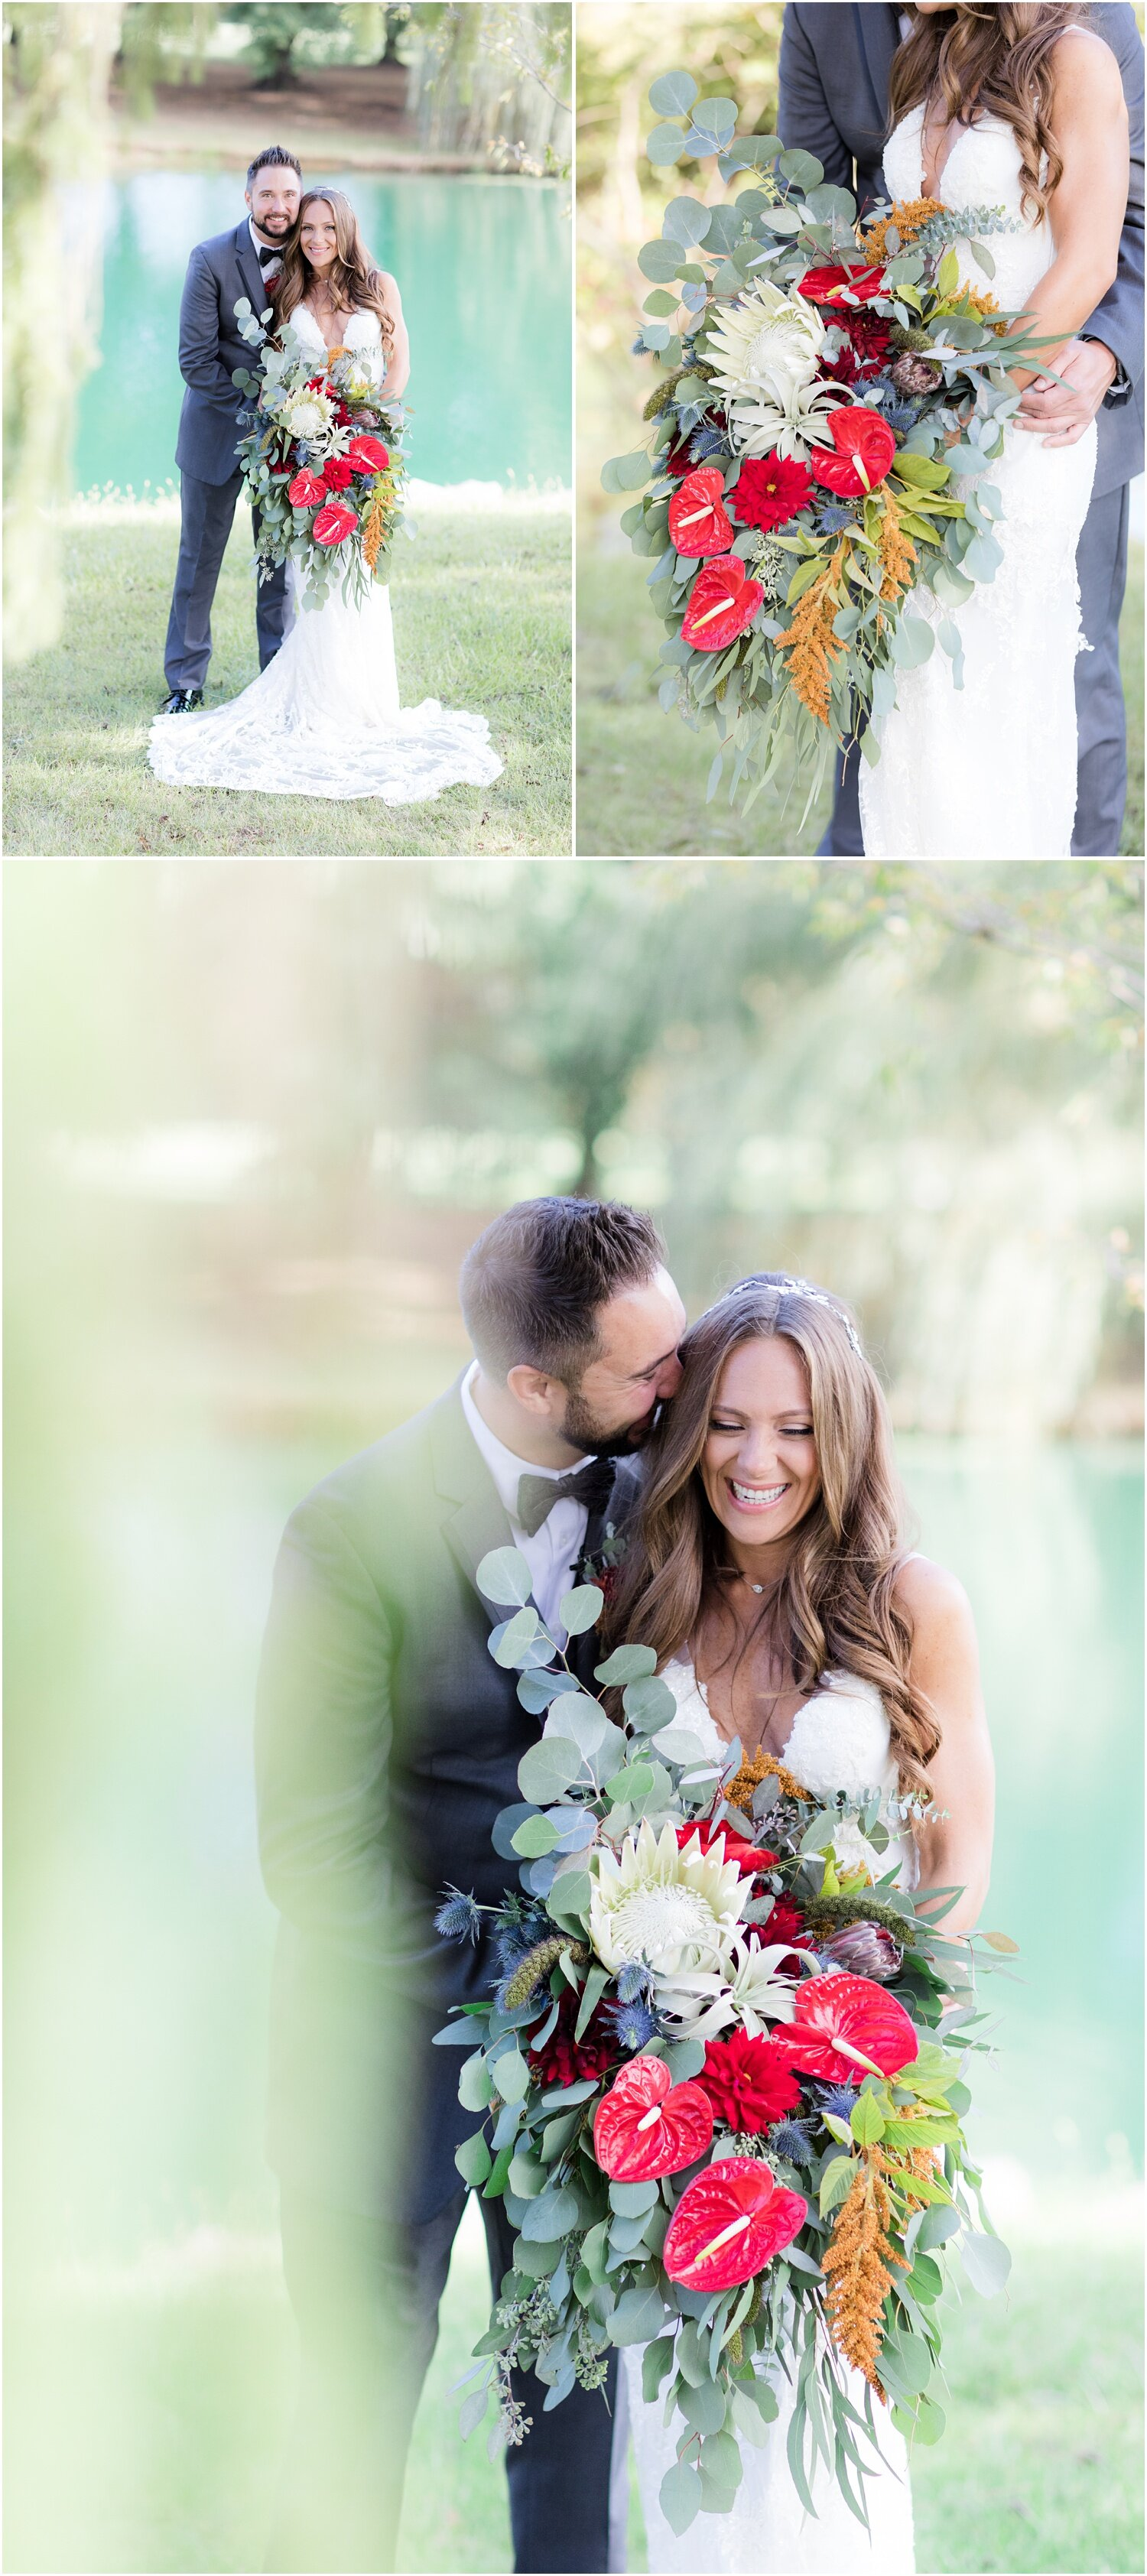 Romantic lakeside wedding photos at Windows on the Water at Frogbridge.